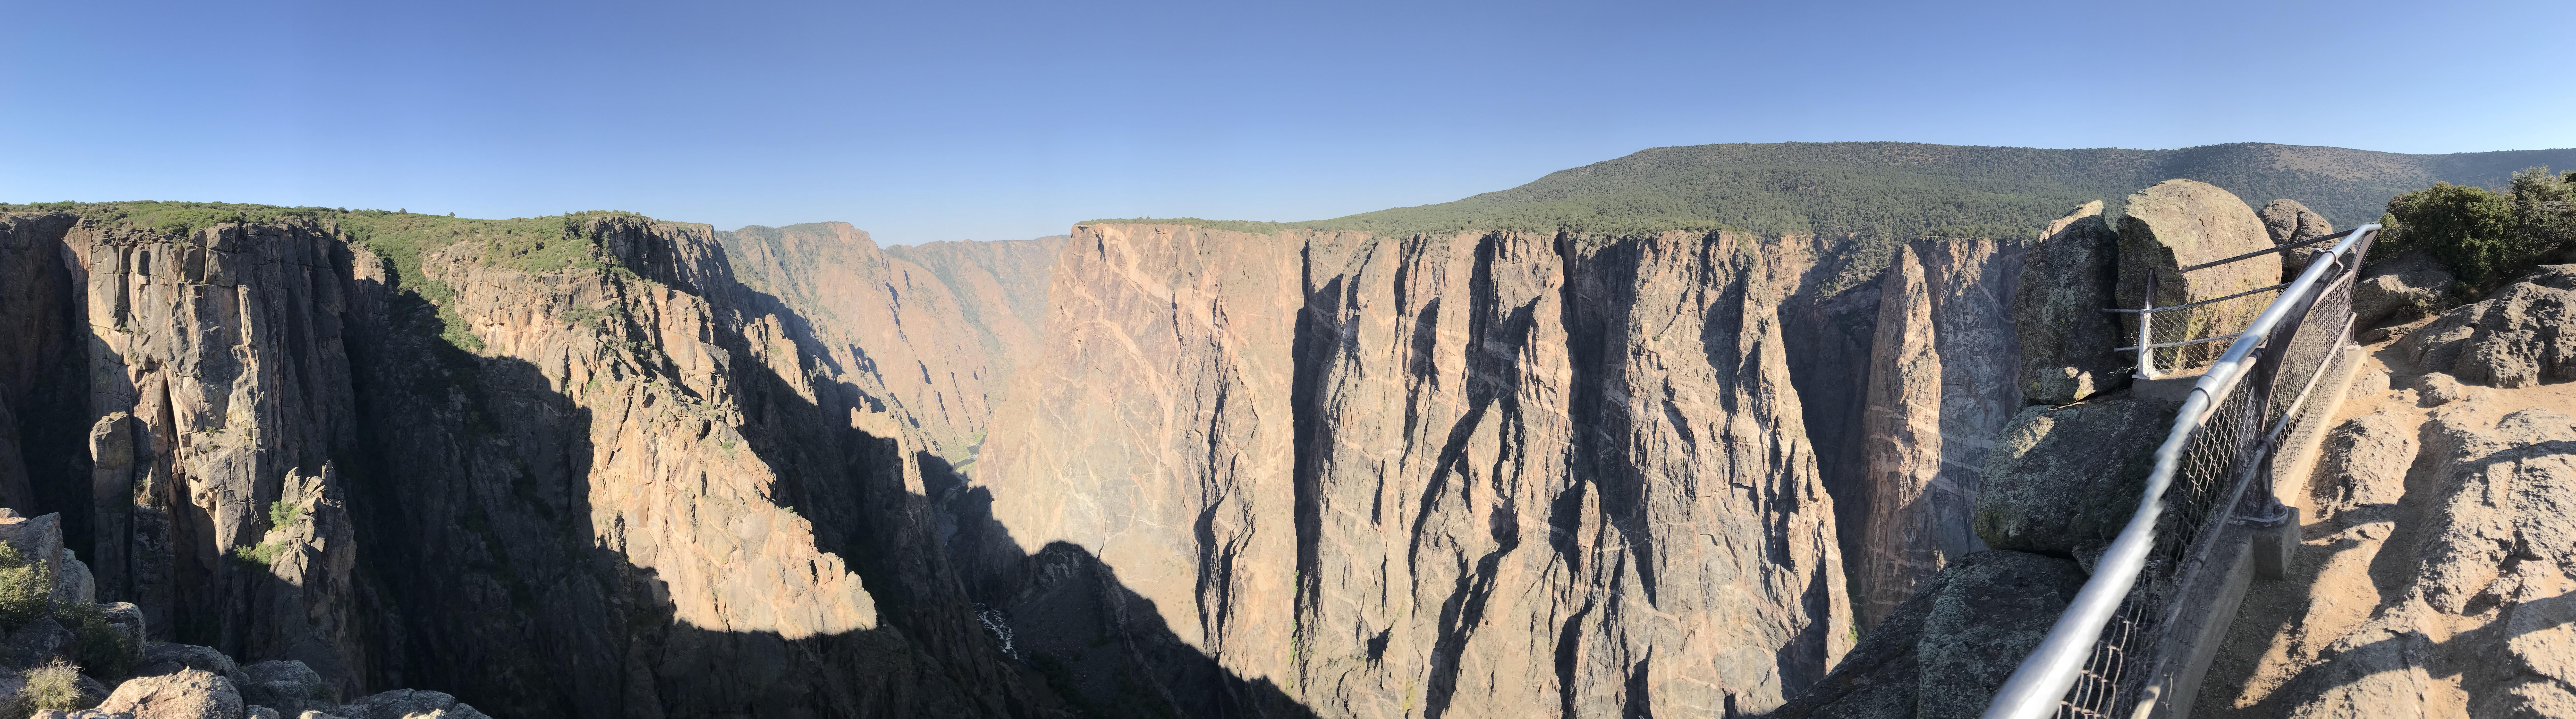 Black Canyon Painted Wall